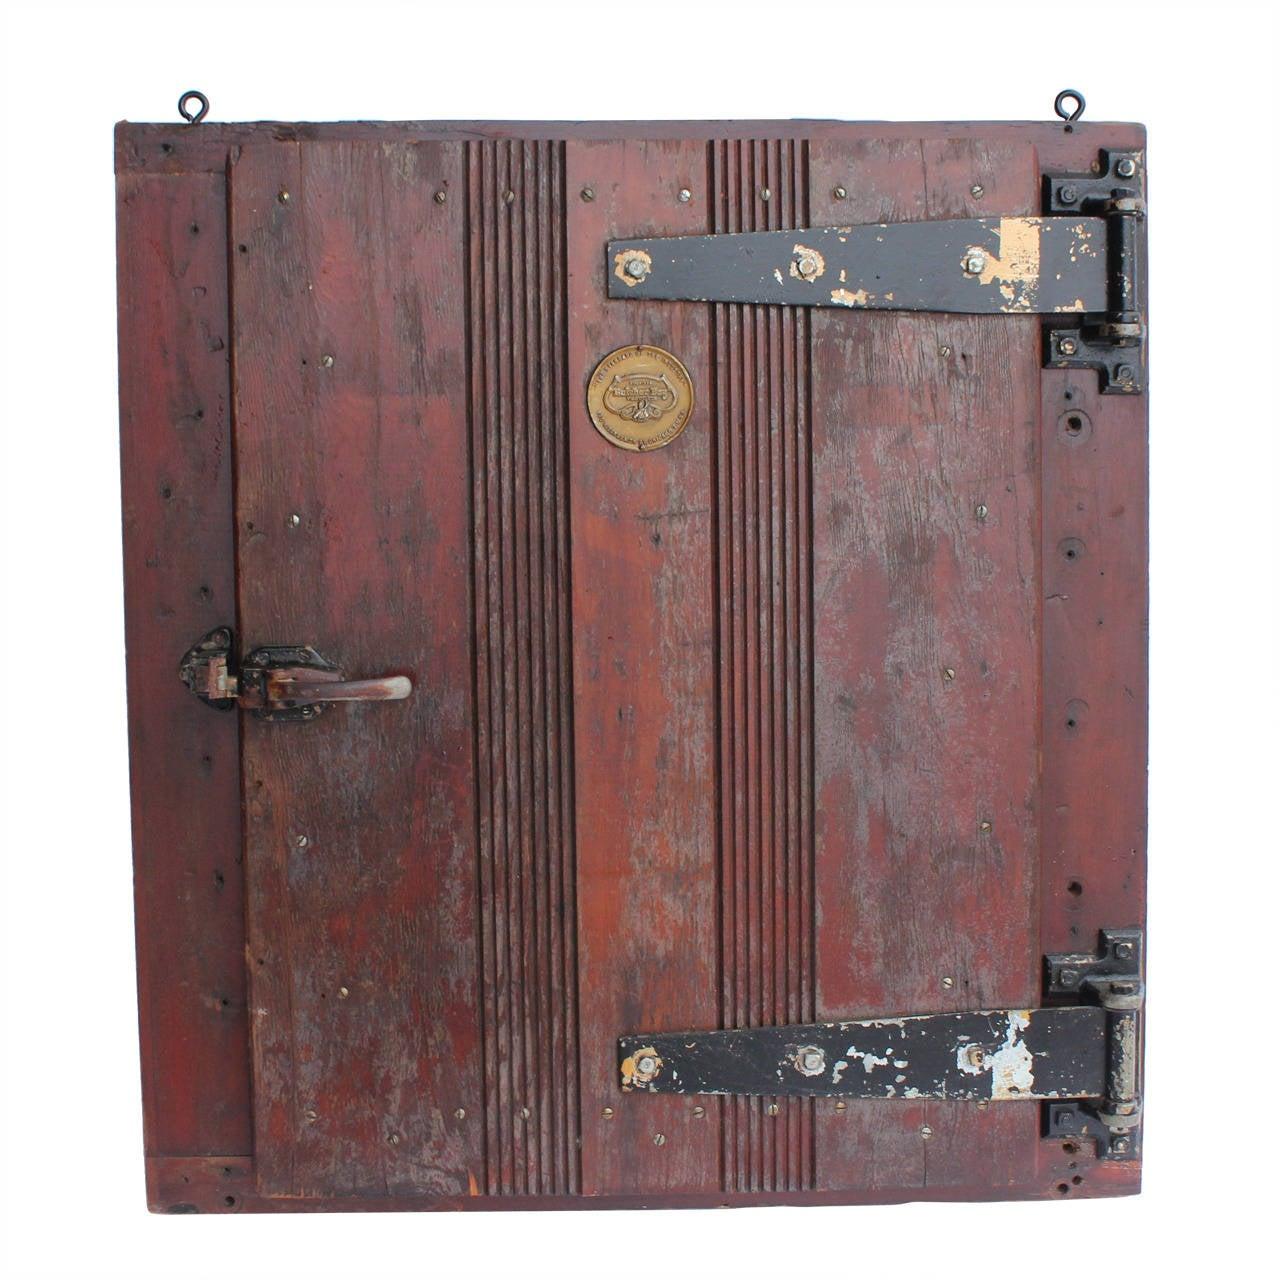 Large Antique Butcher Shop Refrigerate Doors By Butcher Boy Co., Chicago  For Sale